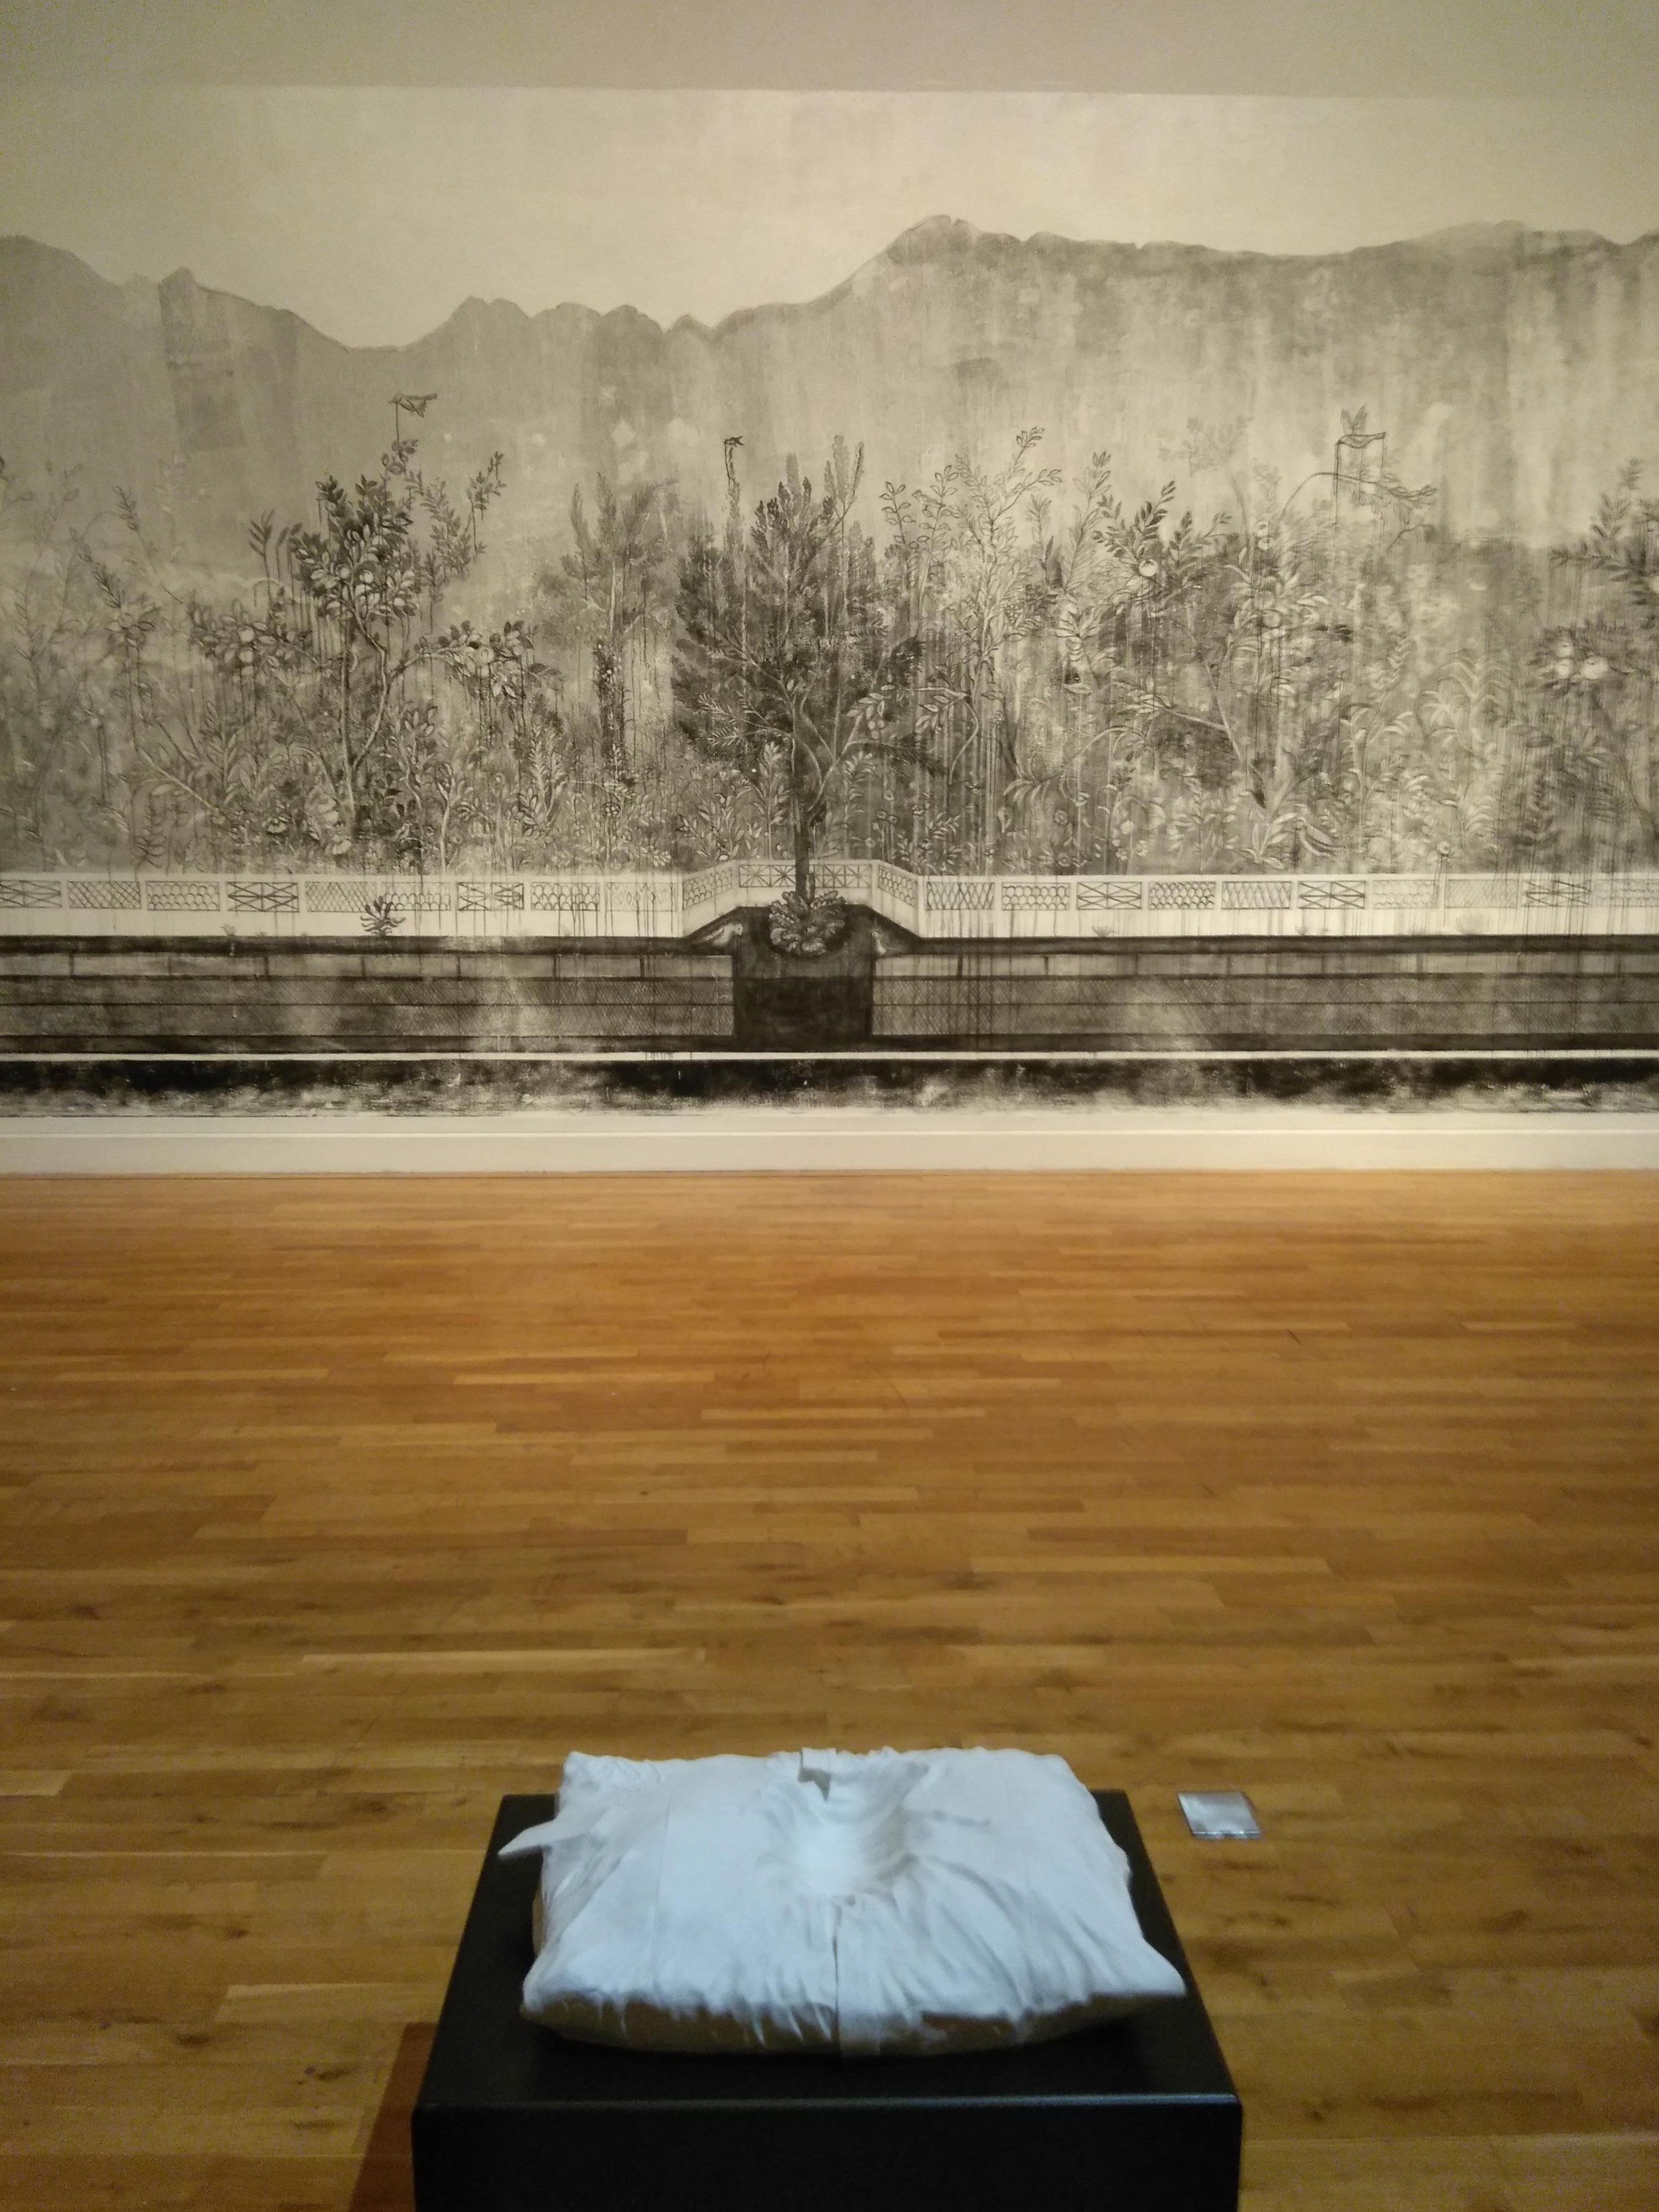 Ursula Burke Exhibition RHA Gallery, Dublin